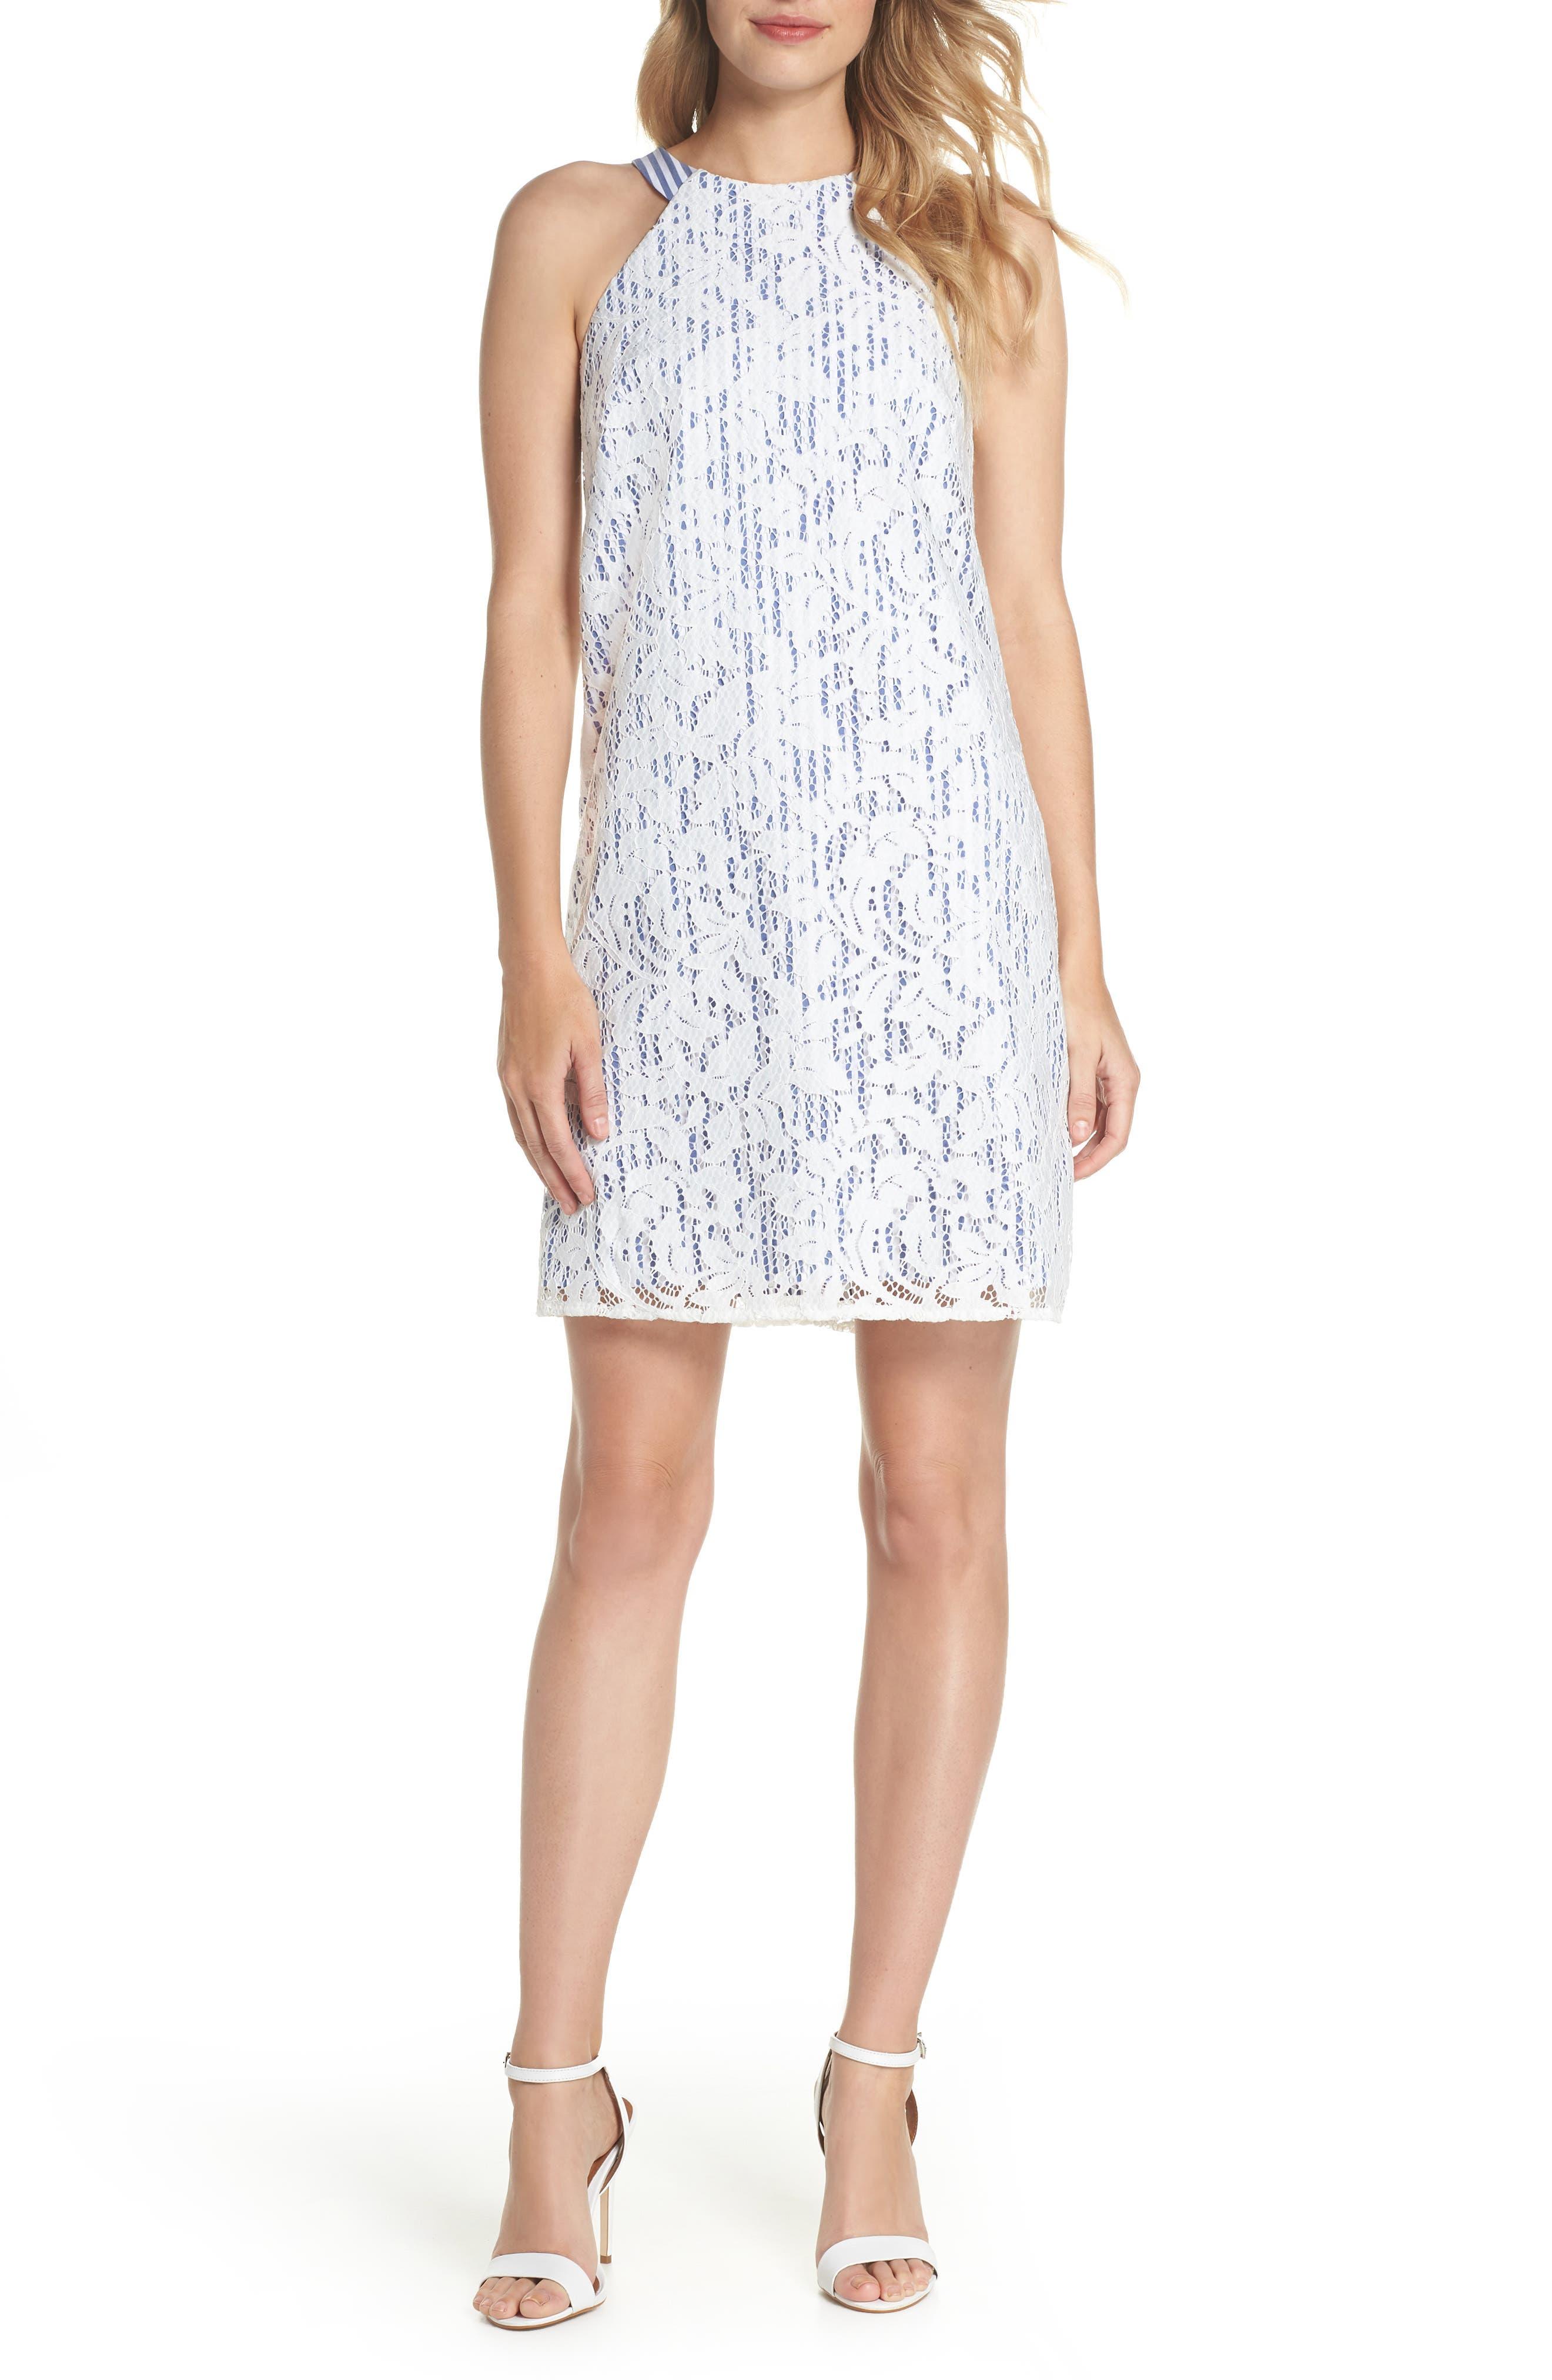 Pinstripe Lace Overlay Shift Dress,                             Main thumbnail 1, color,                             WHITE/ BLUE